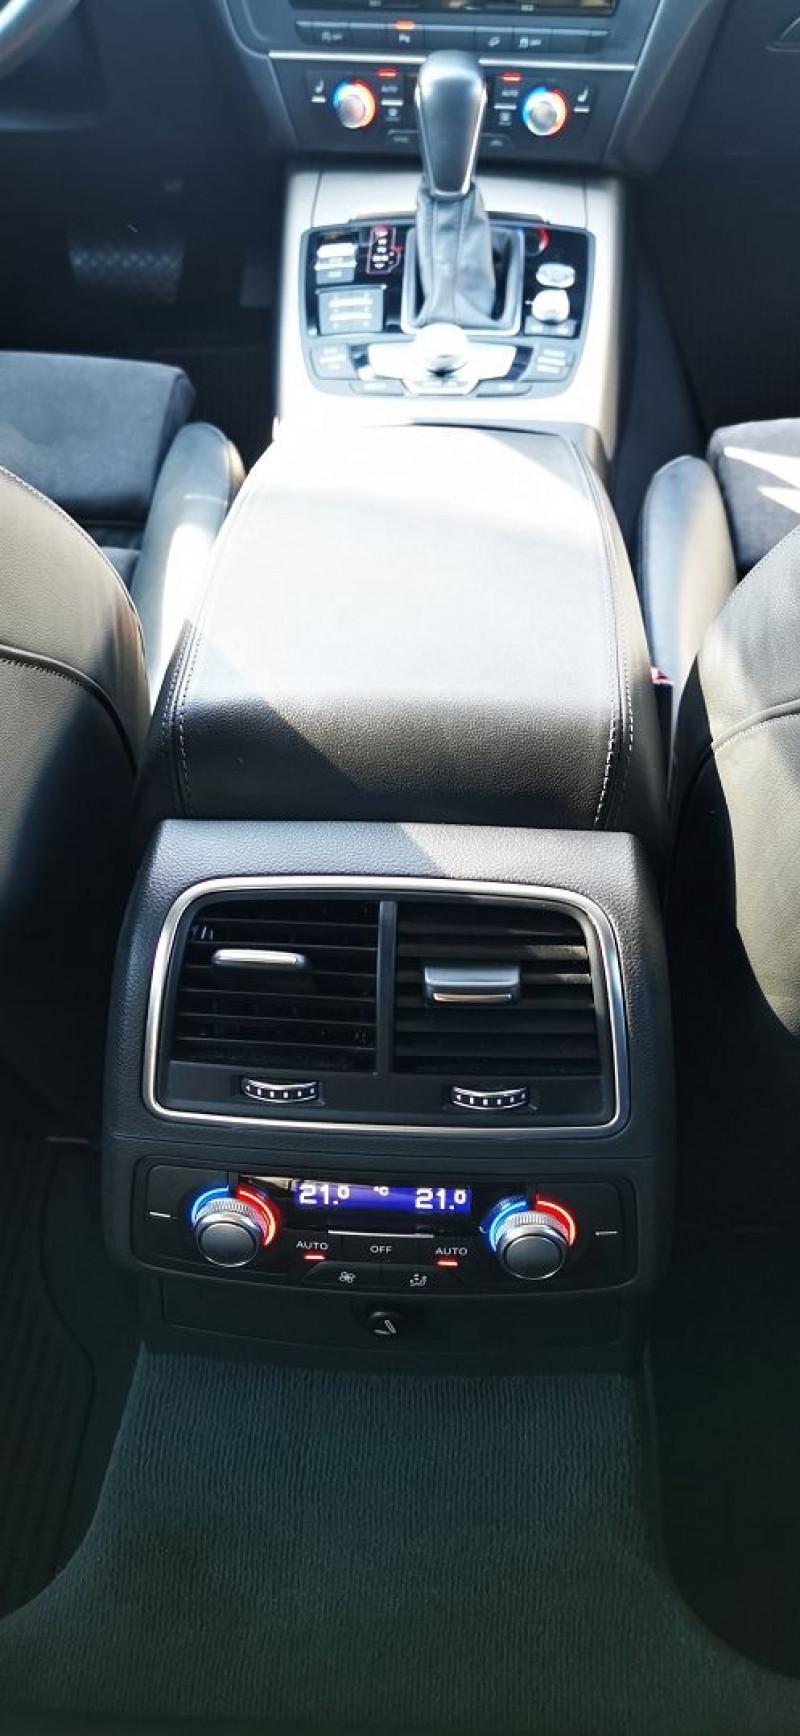 Photo 17 de l'offre de AUDI A6 ALLROAD 3.0 V6 BITDI 320CH AMBITION LUXE QUATTRO TIPTRONIC à 41490€ chez Maximum Automobiles